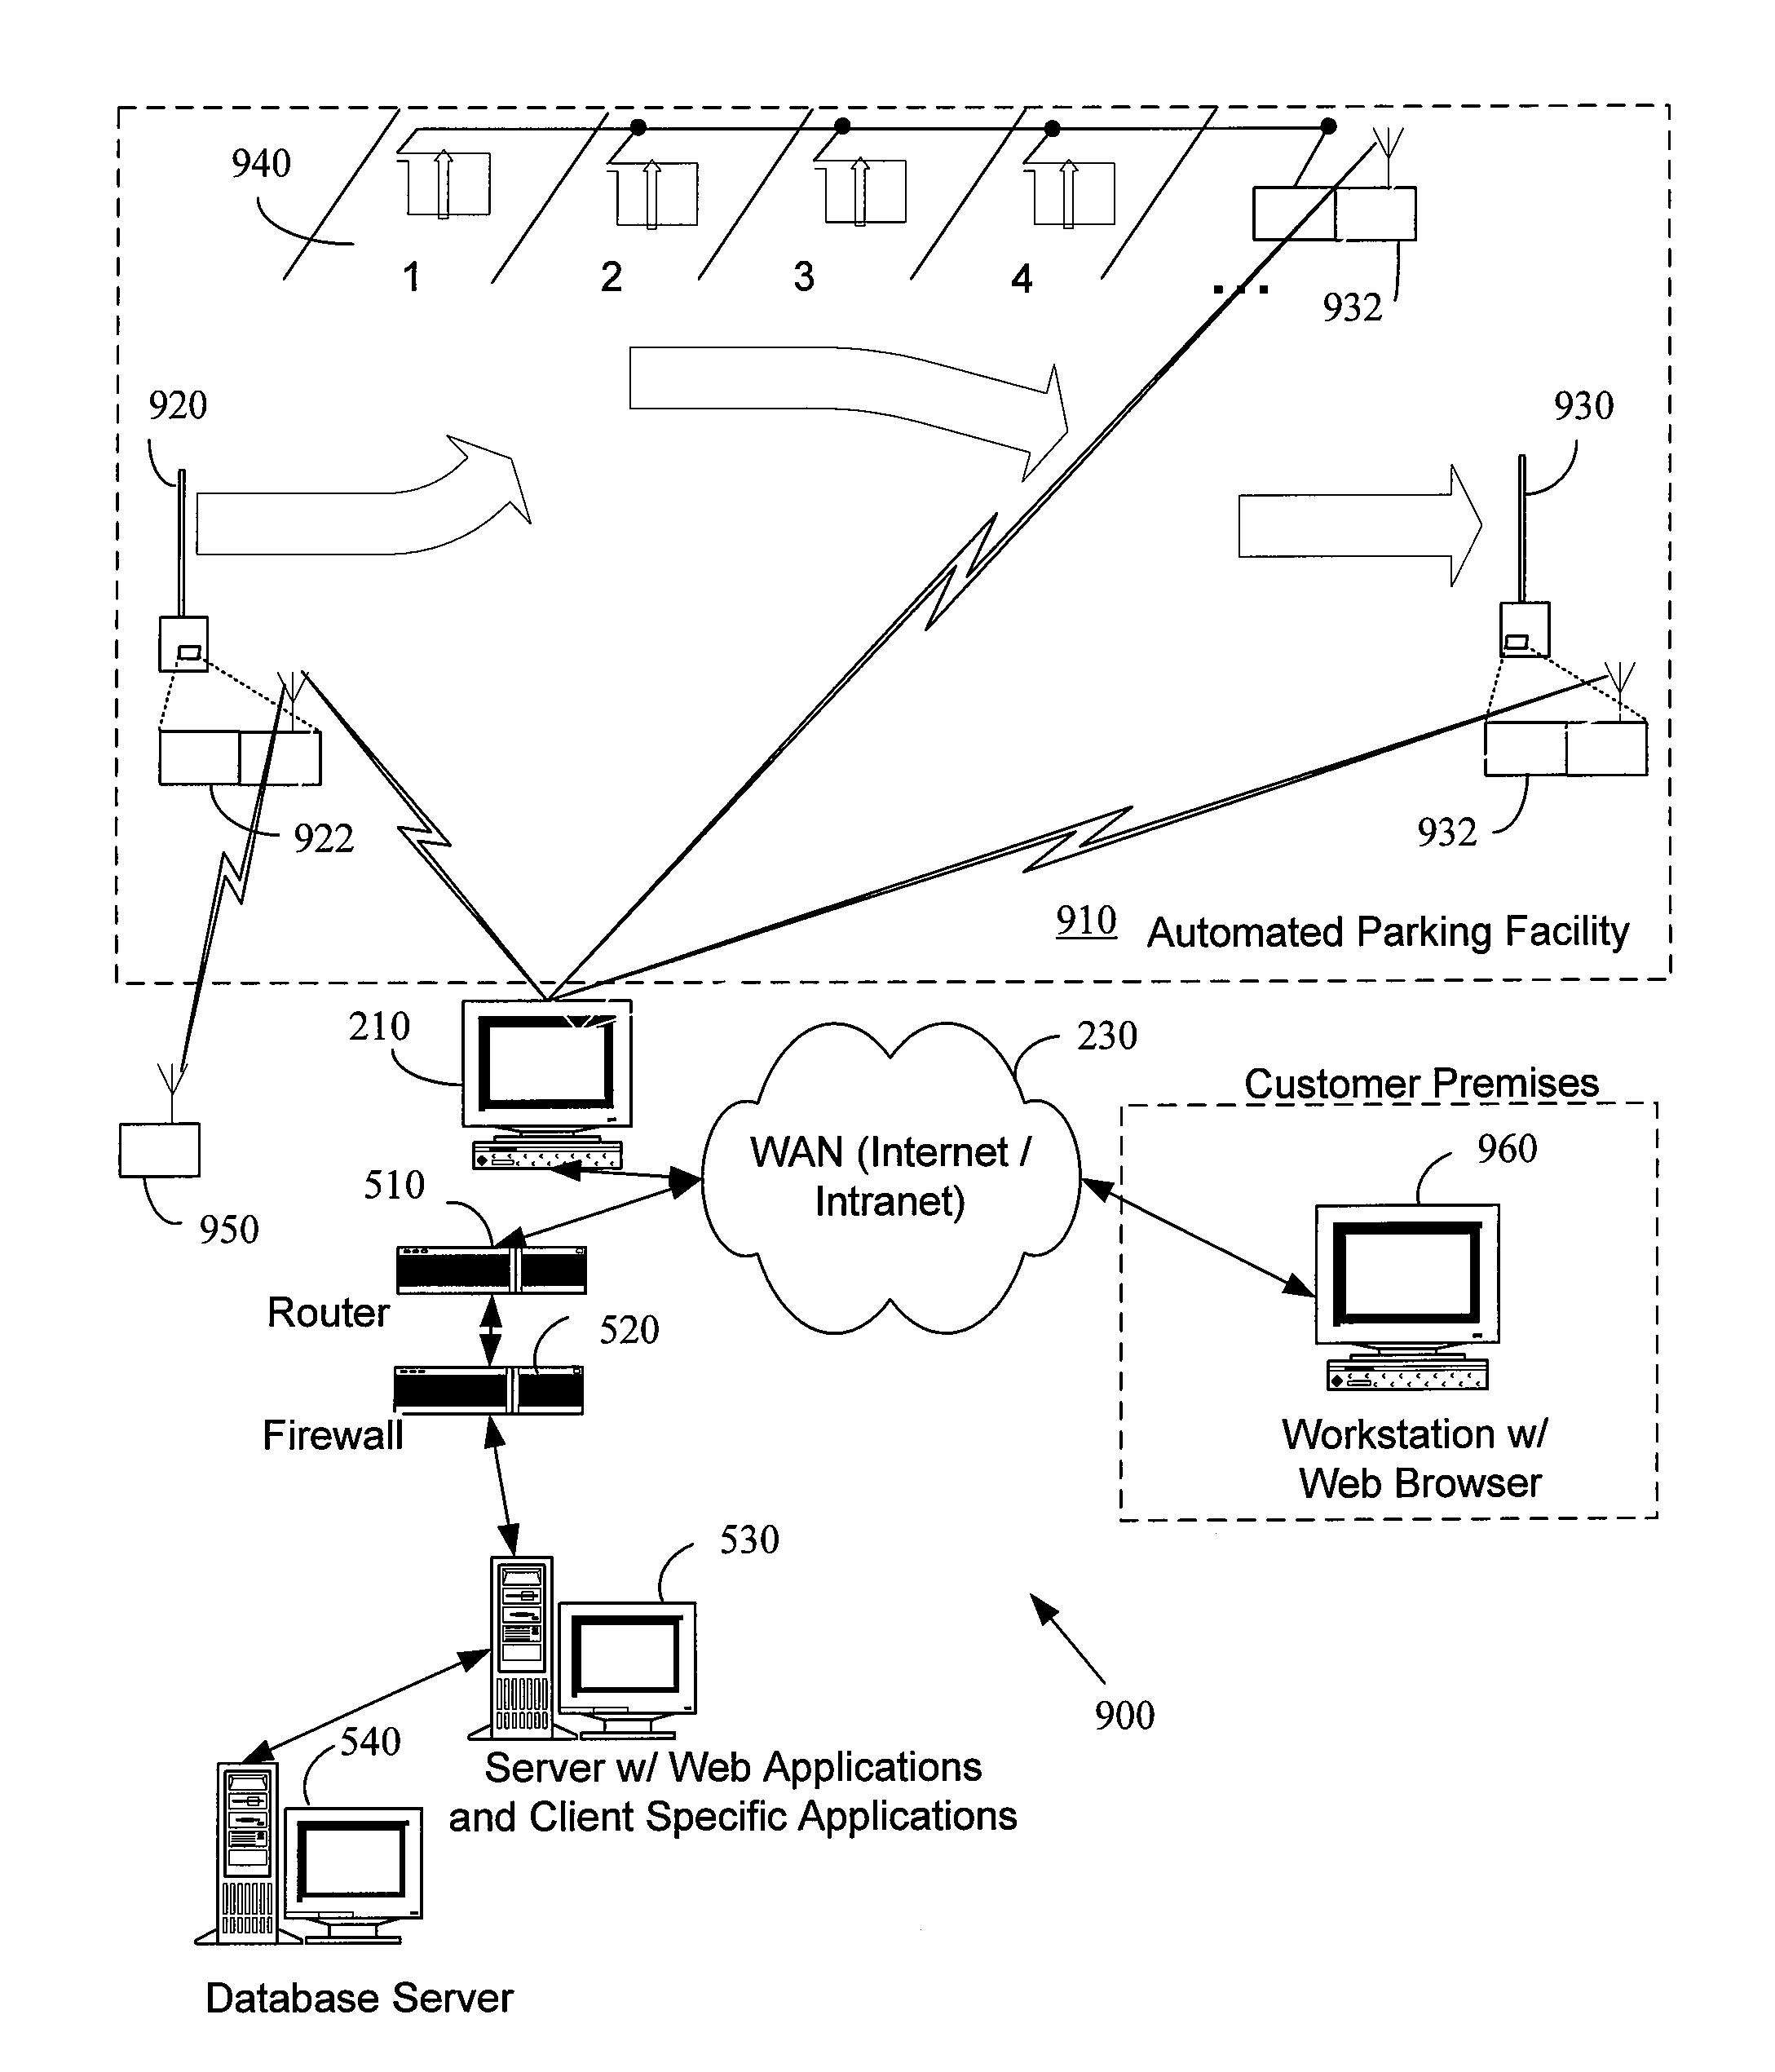 Ziemlich Bosch 02 Sensor Draht Diagramm Fotos - Schaltplan Serie ...